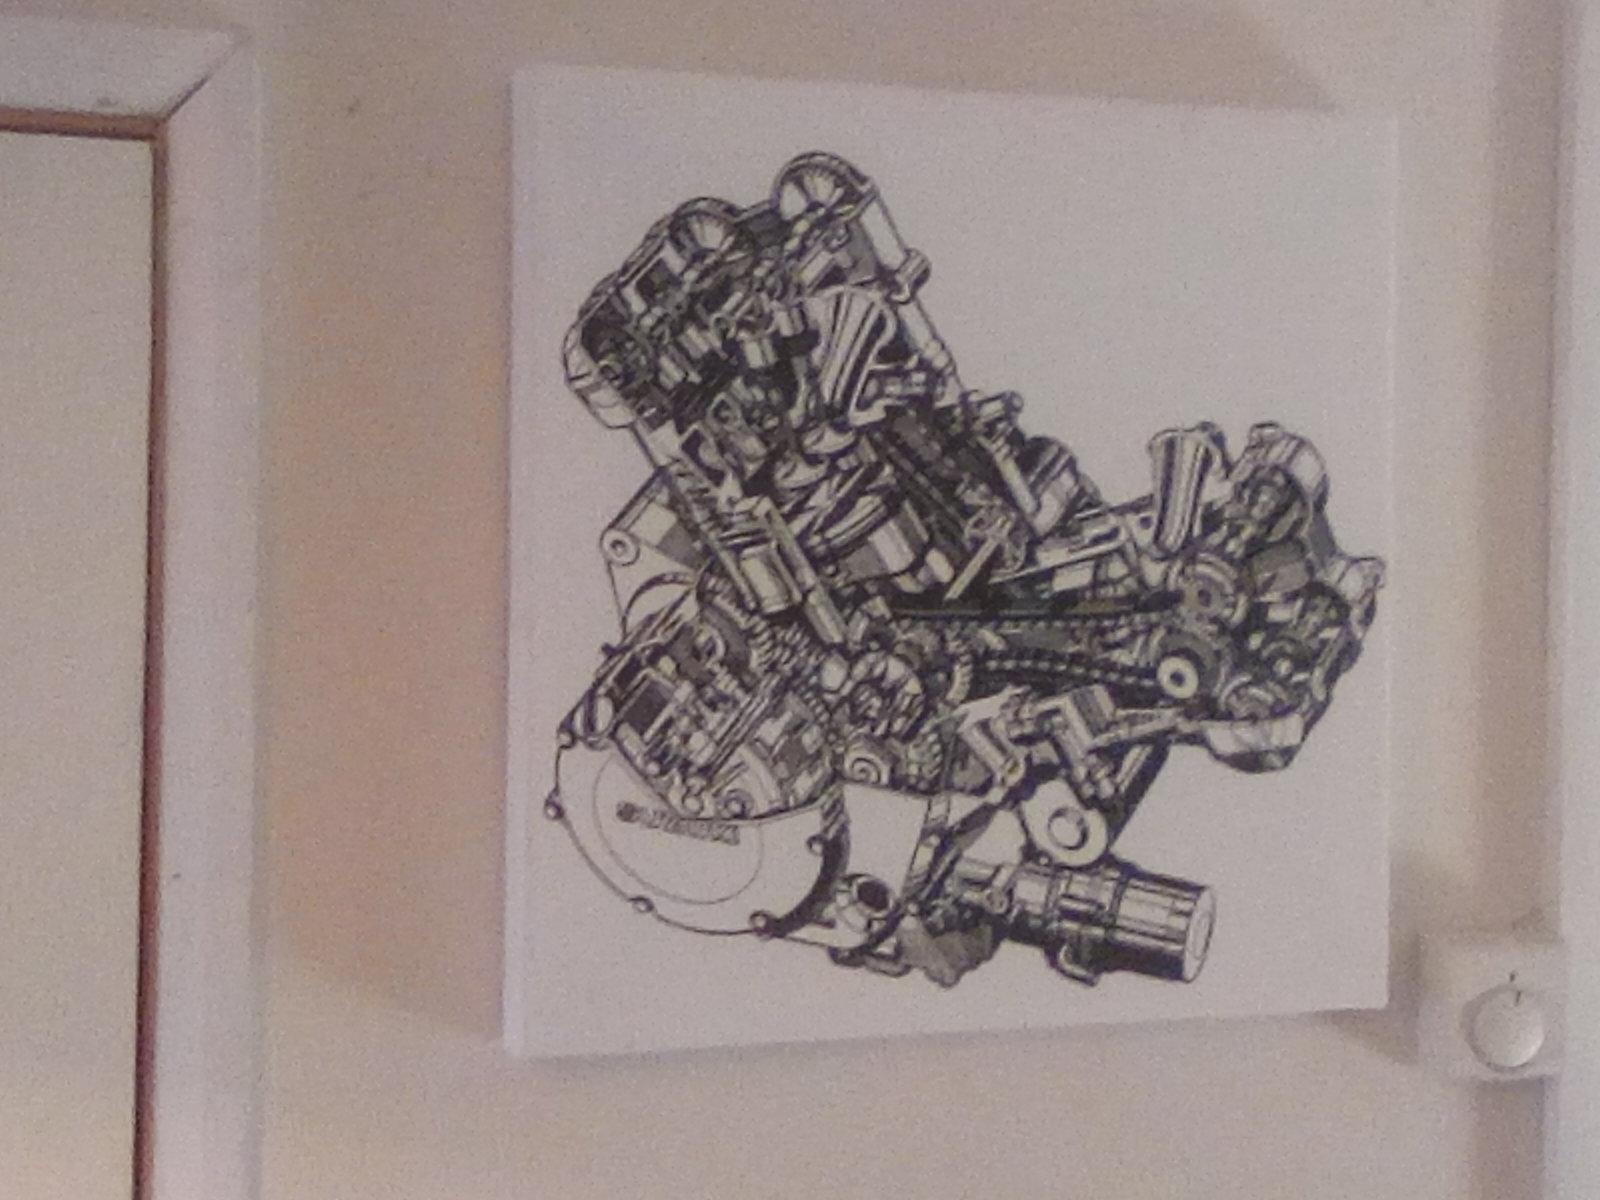 New art in my hallway-img_20190825_113019-79276-.jpg